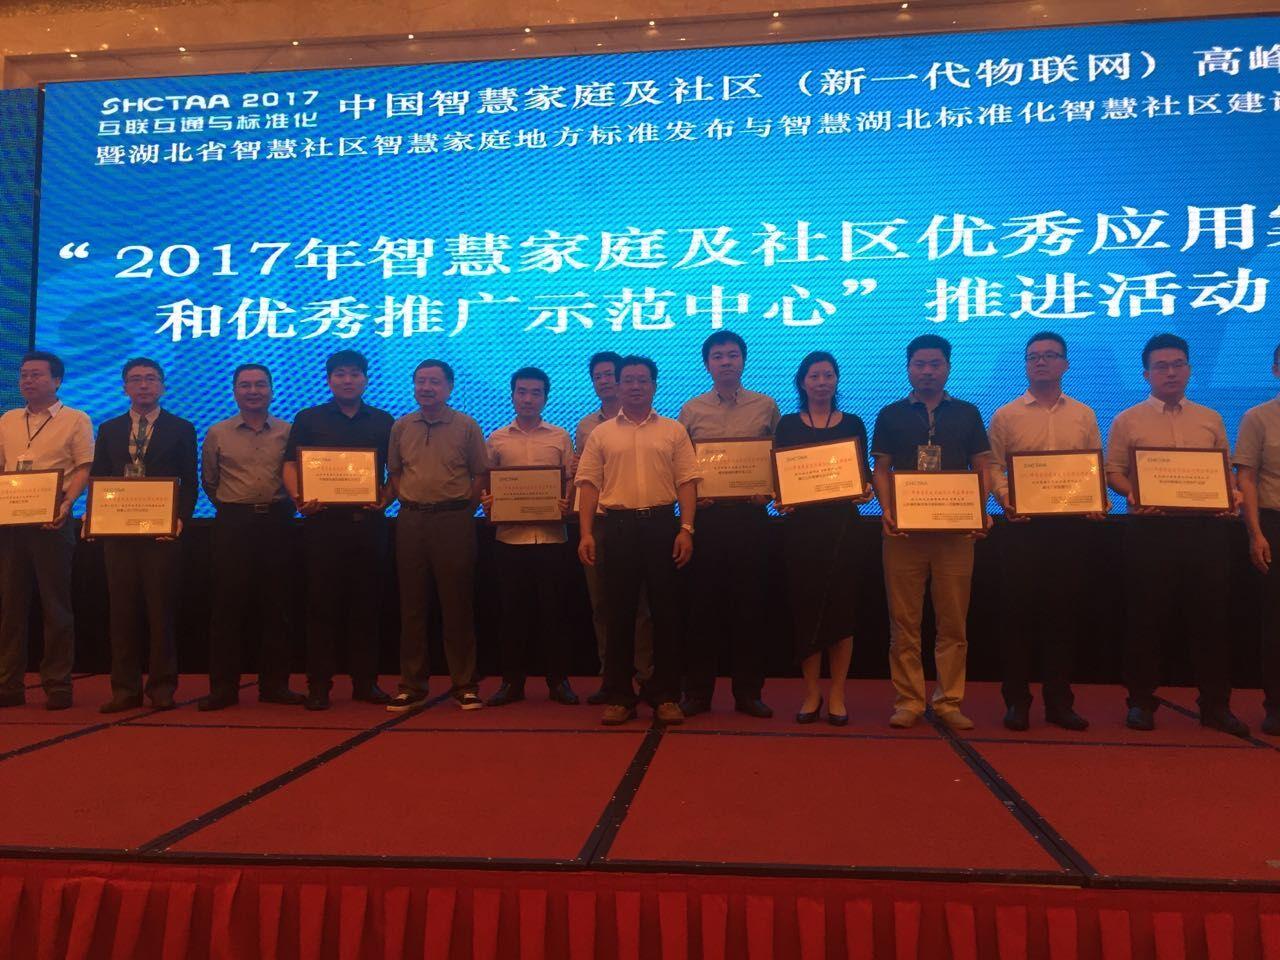 WULIAN应邀出席2017中国智慧家庭及社区高峰论坛.jpg